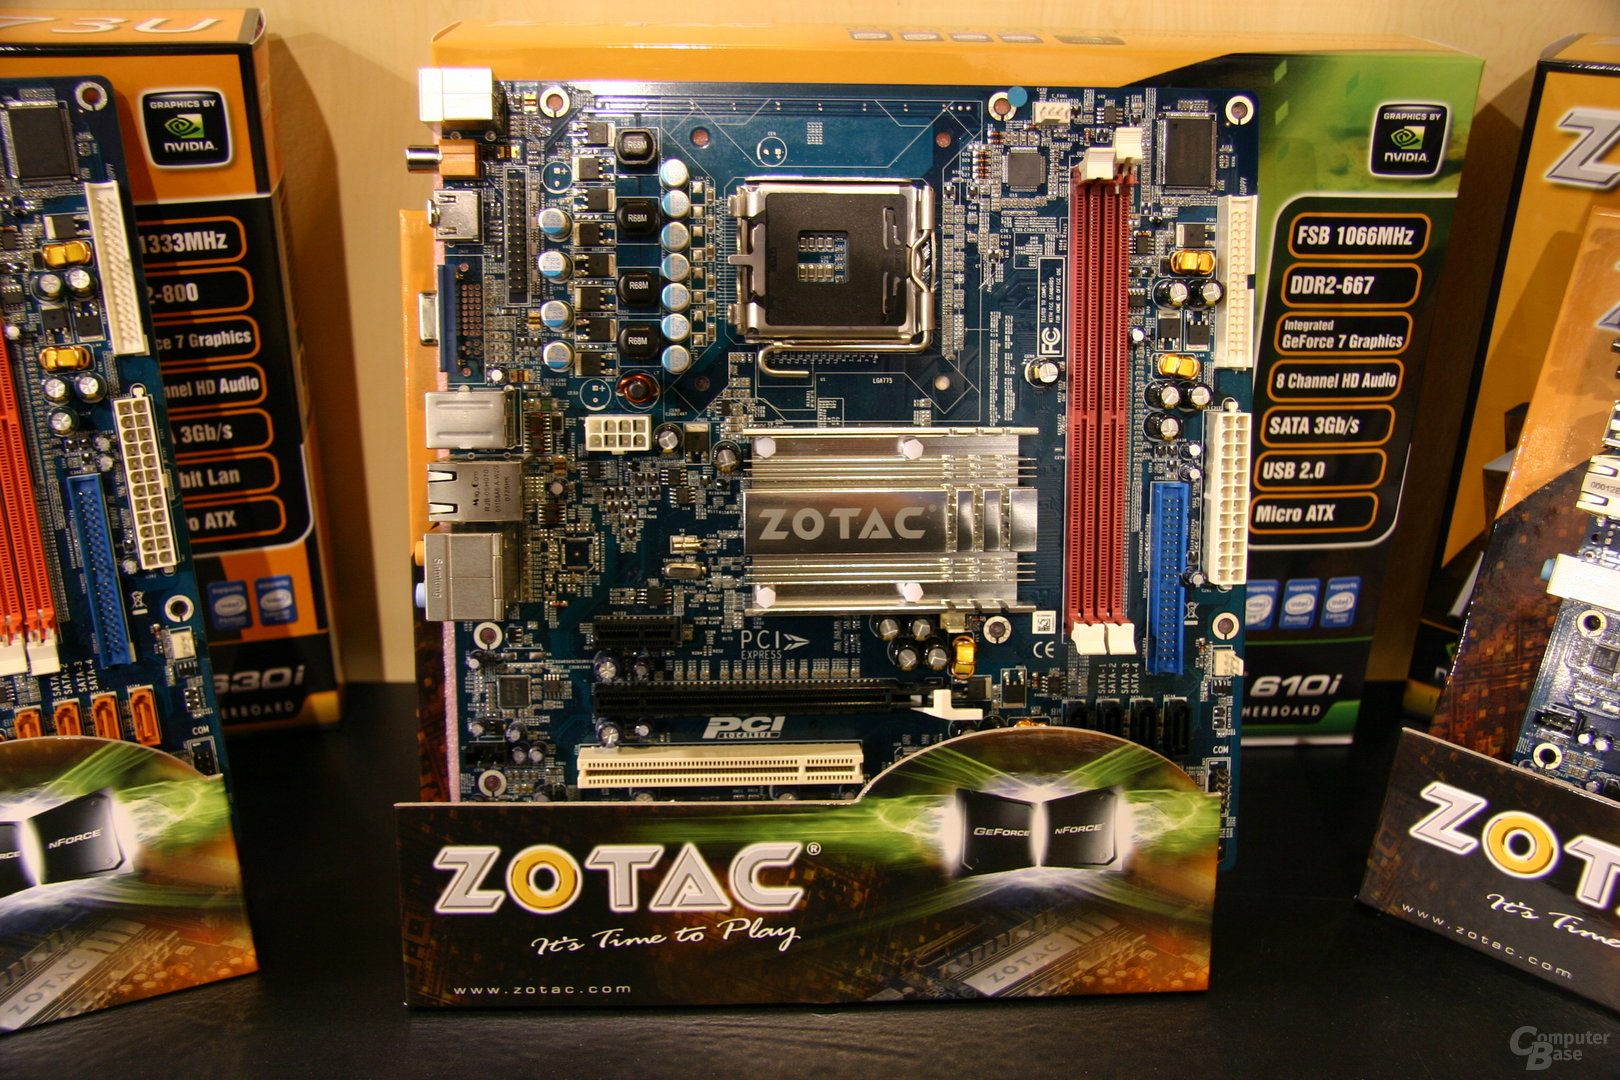 Zotac N73PV-Supreme